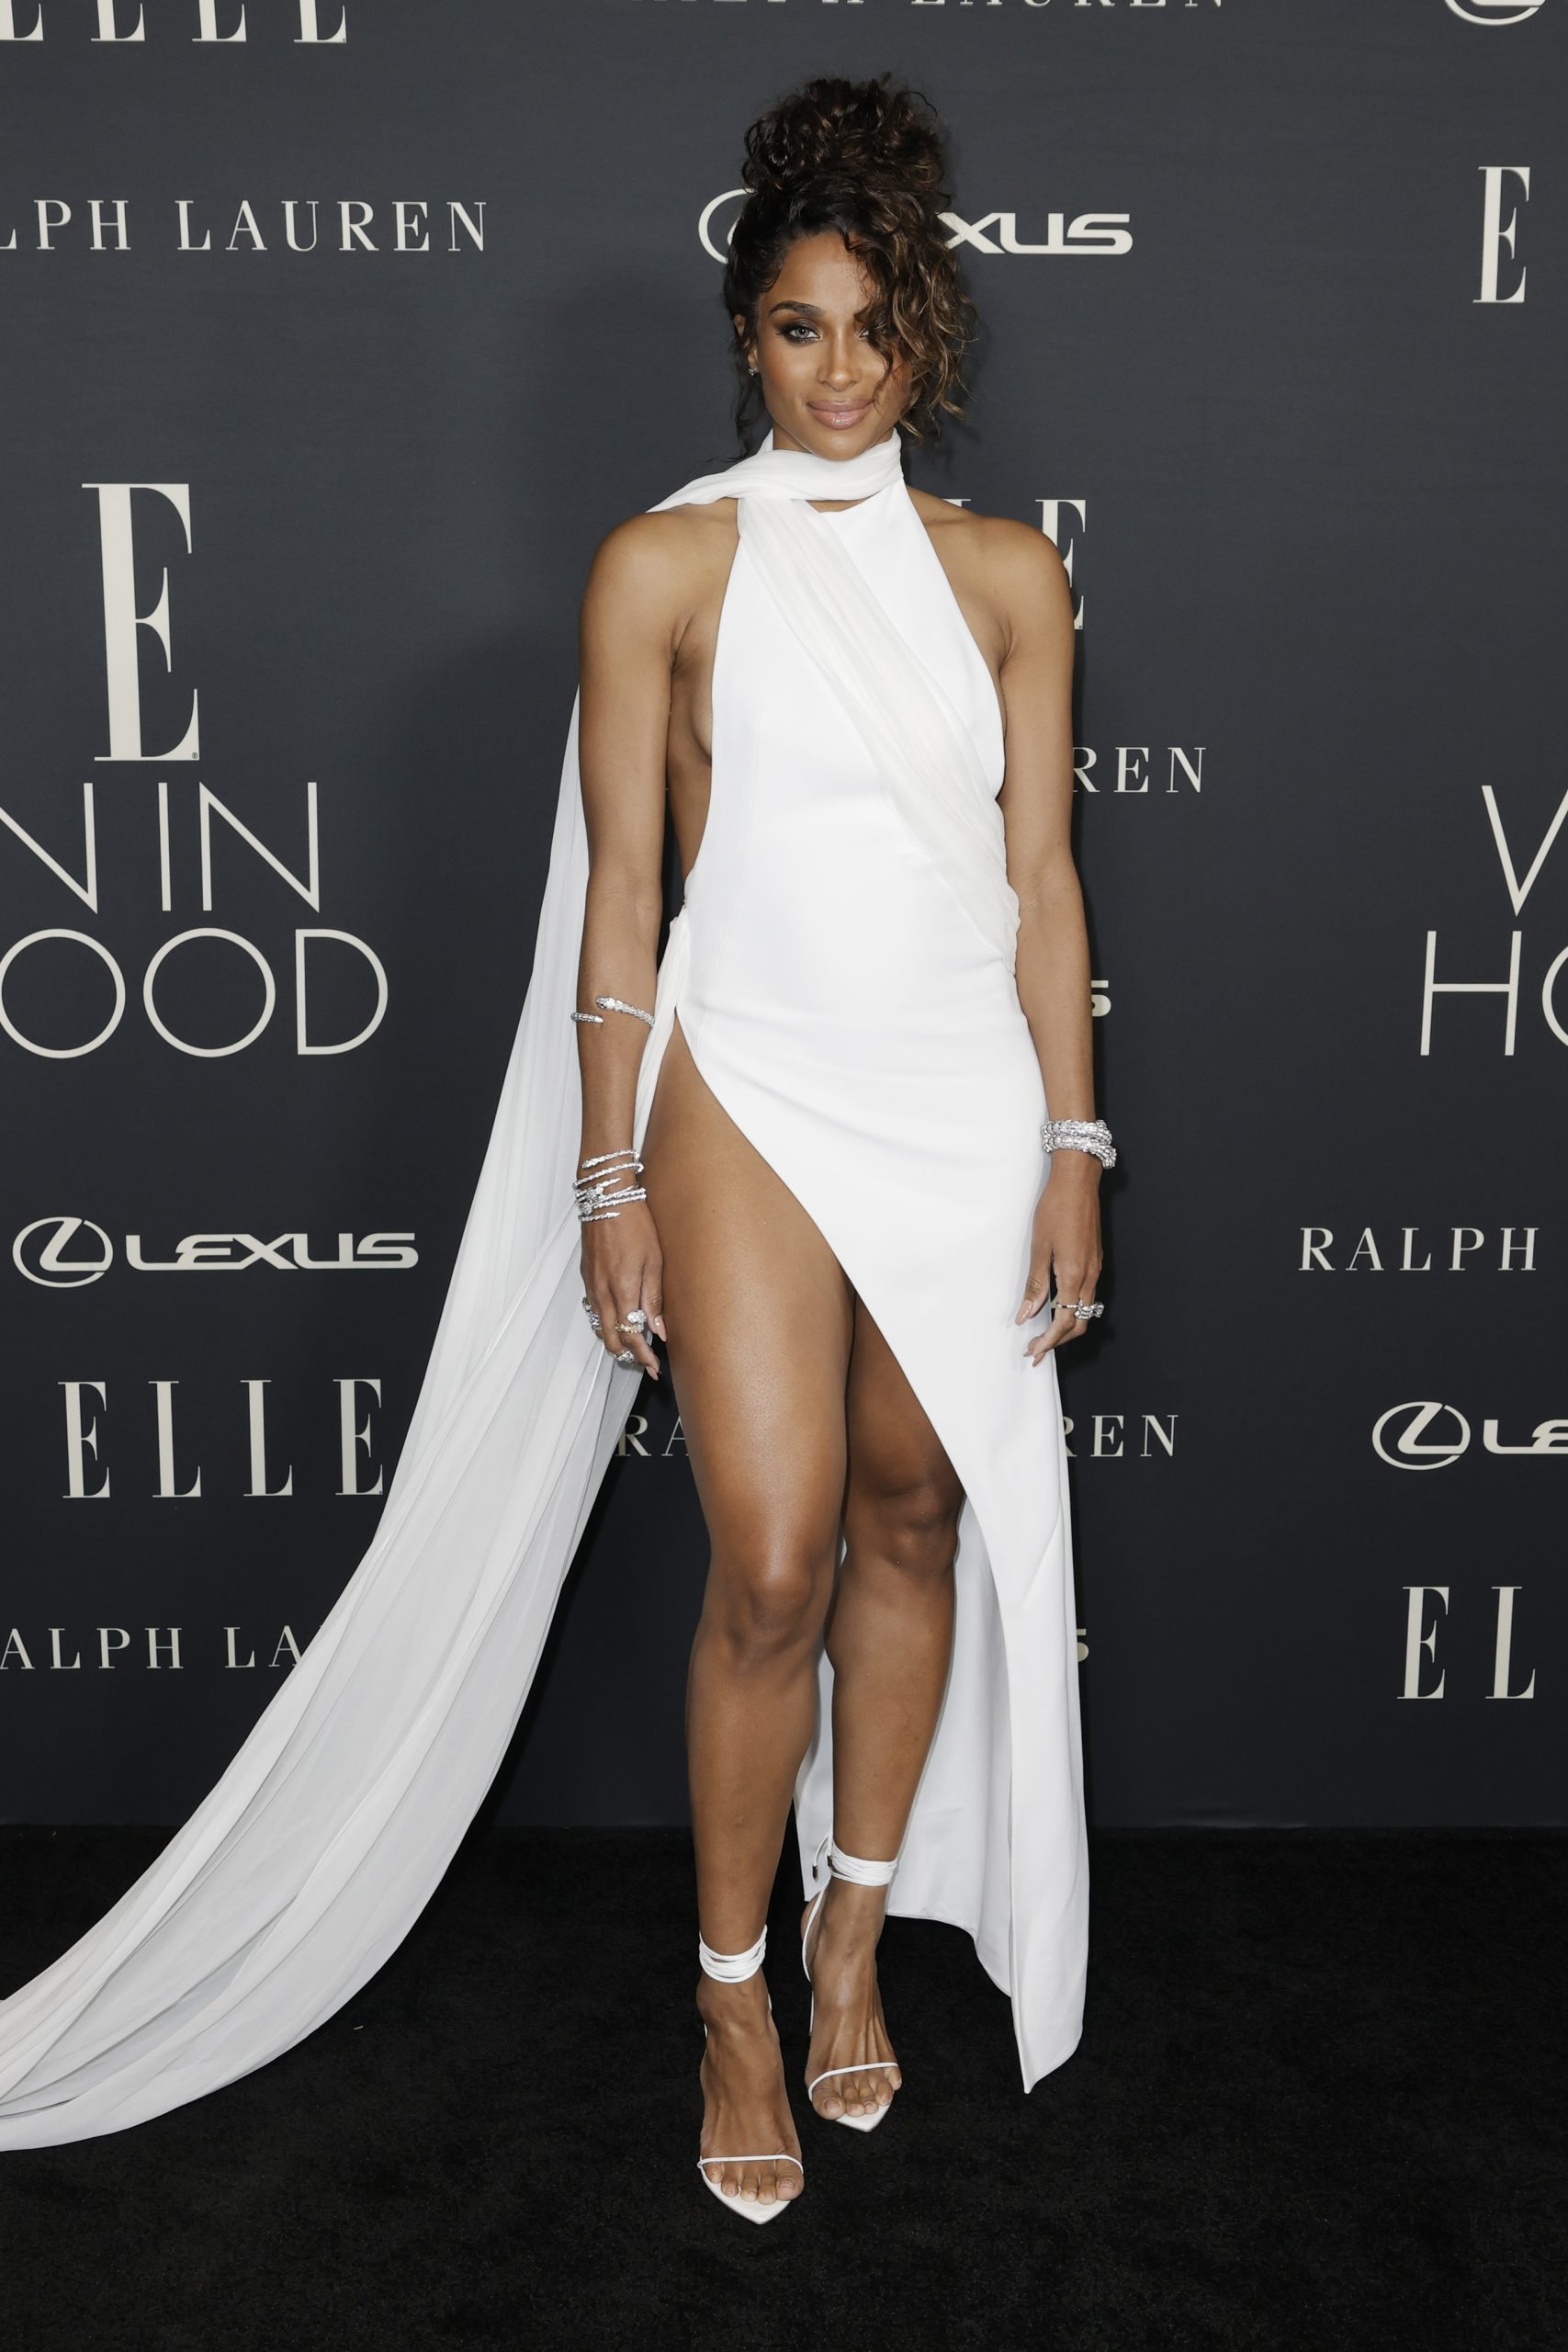 Ciara At Wardrobe Breakdown: Ciara At 27th Annual ELLE Women in Hollywood Celebration